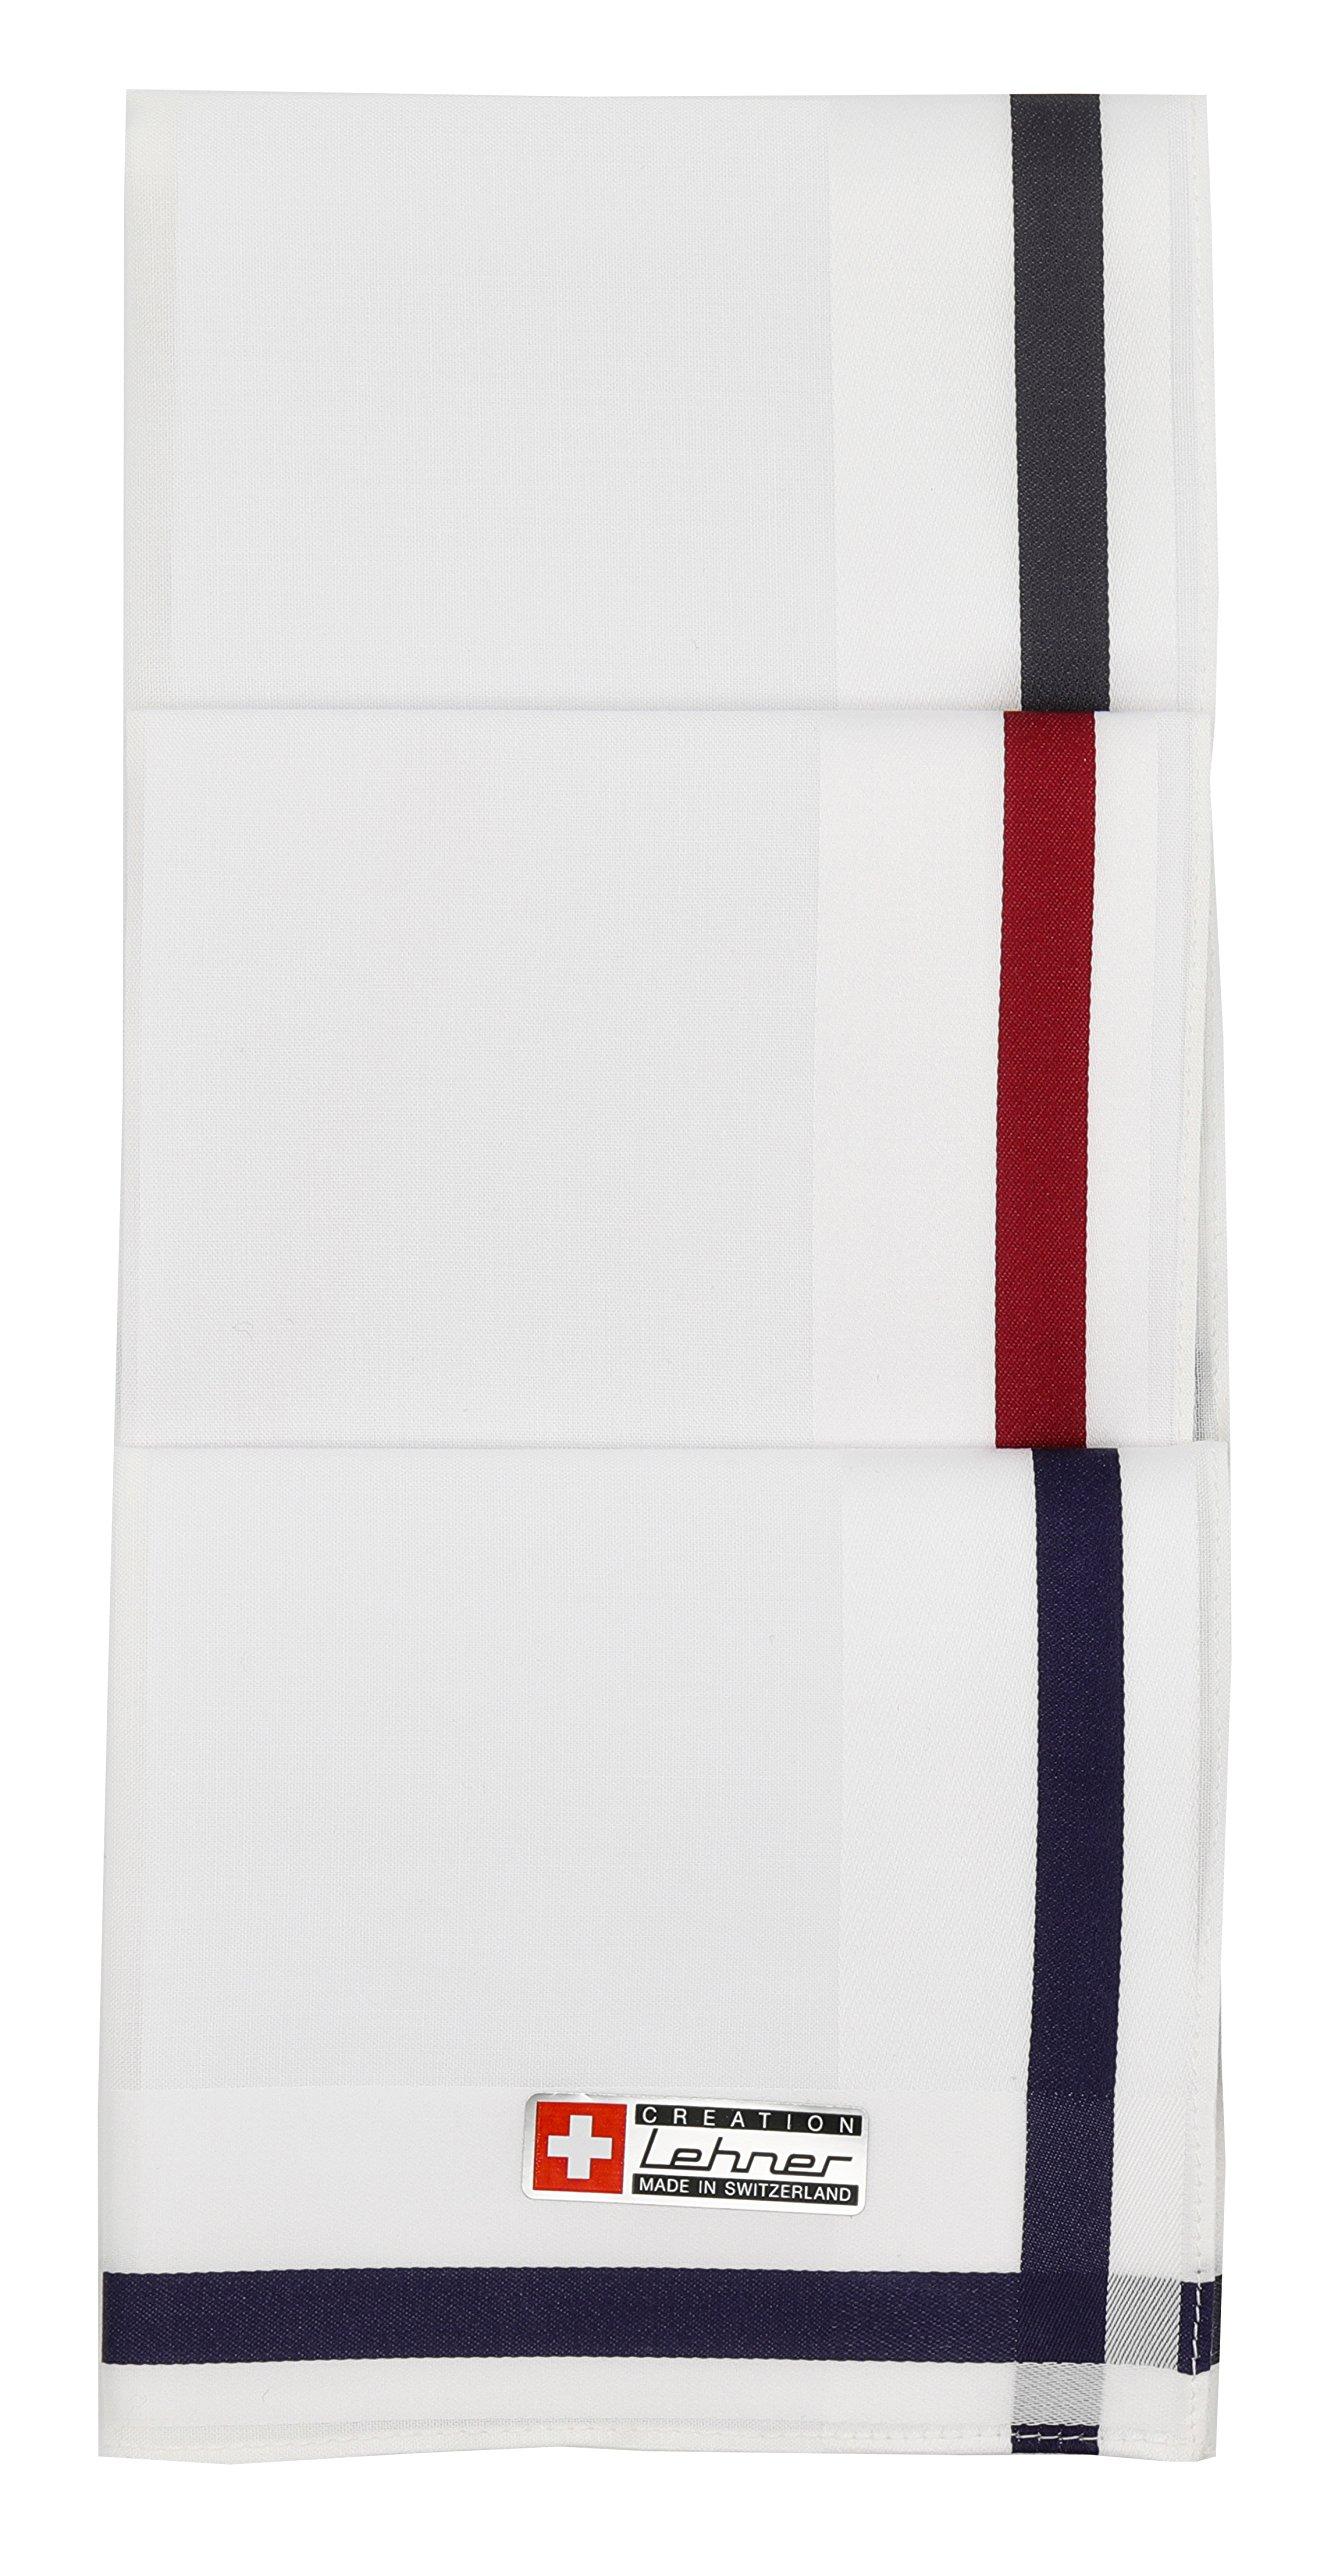 Lehner Switzerland Men's White Fancy Woven Cotton Handkerchiefs (Set of 3) in Red, Blue, Gray